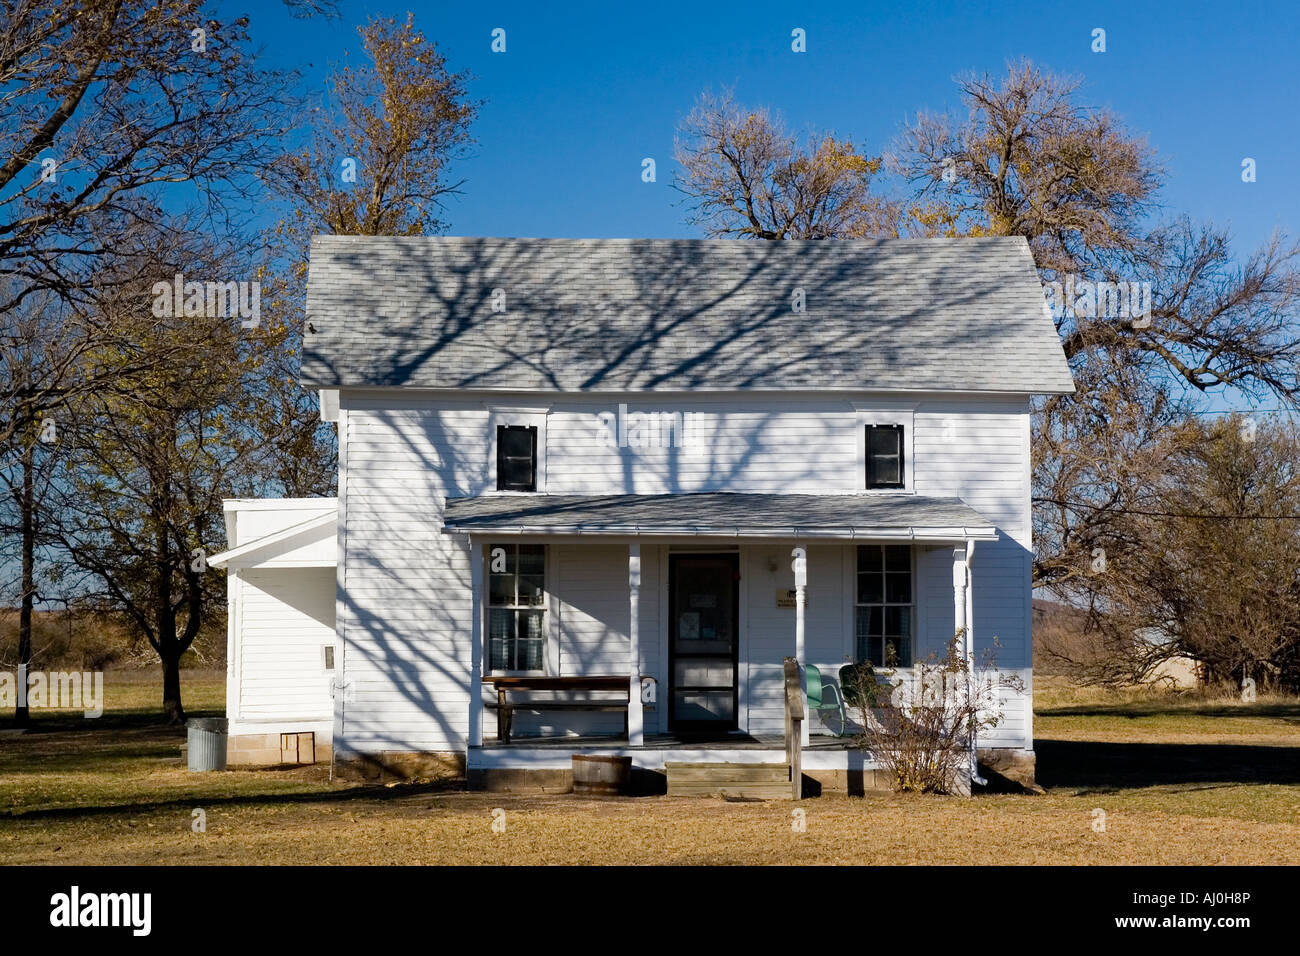 Kansas Farm House Imágenes De Stock & Kansas Farm House Fotos De ...